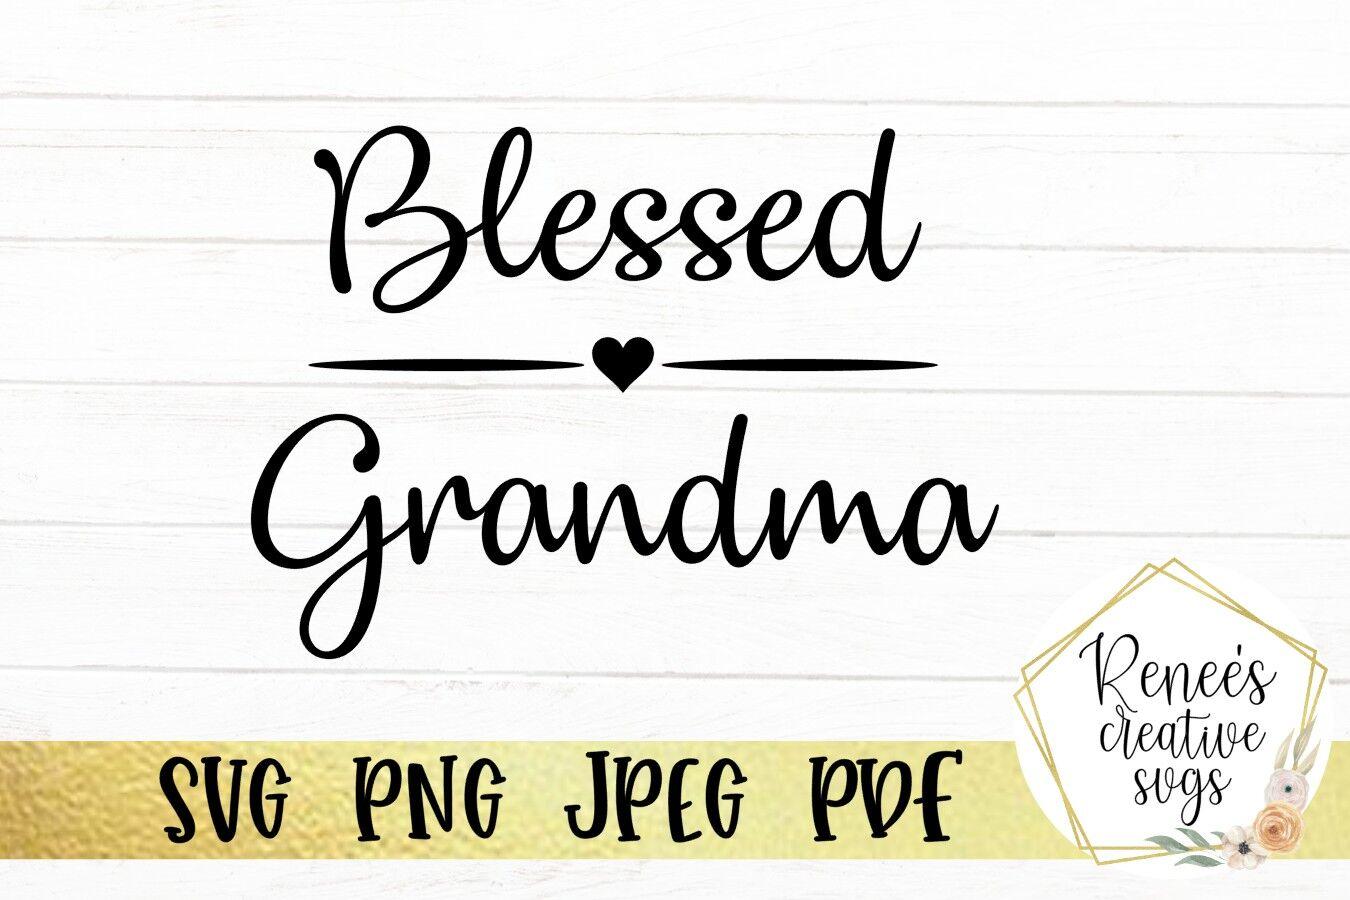 Blessed Grandma Svg By Renee S Creative Svg S Thehungryjpeg Com